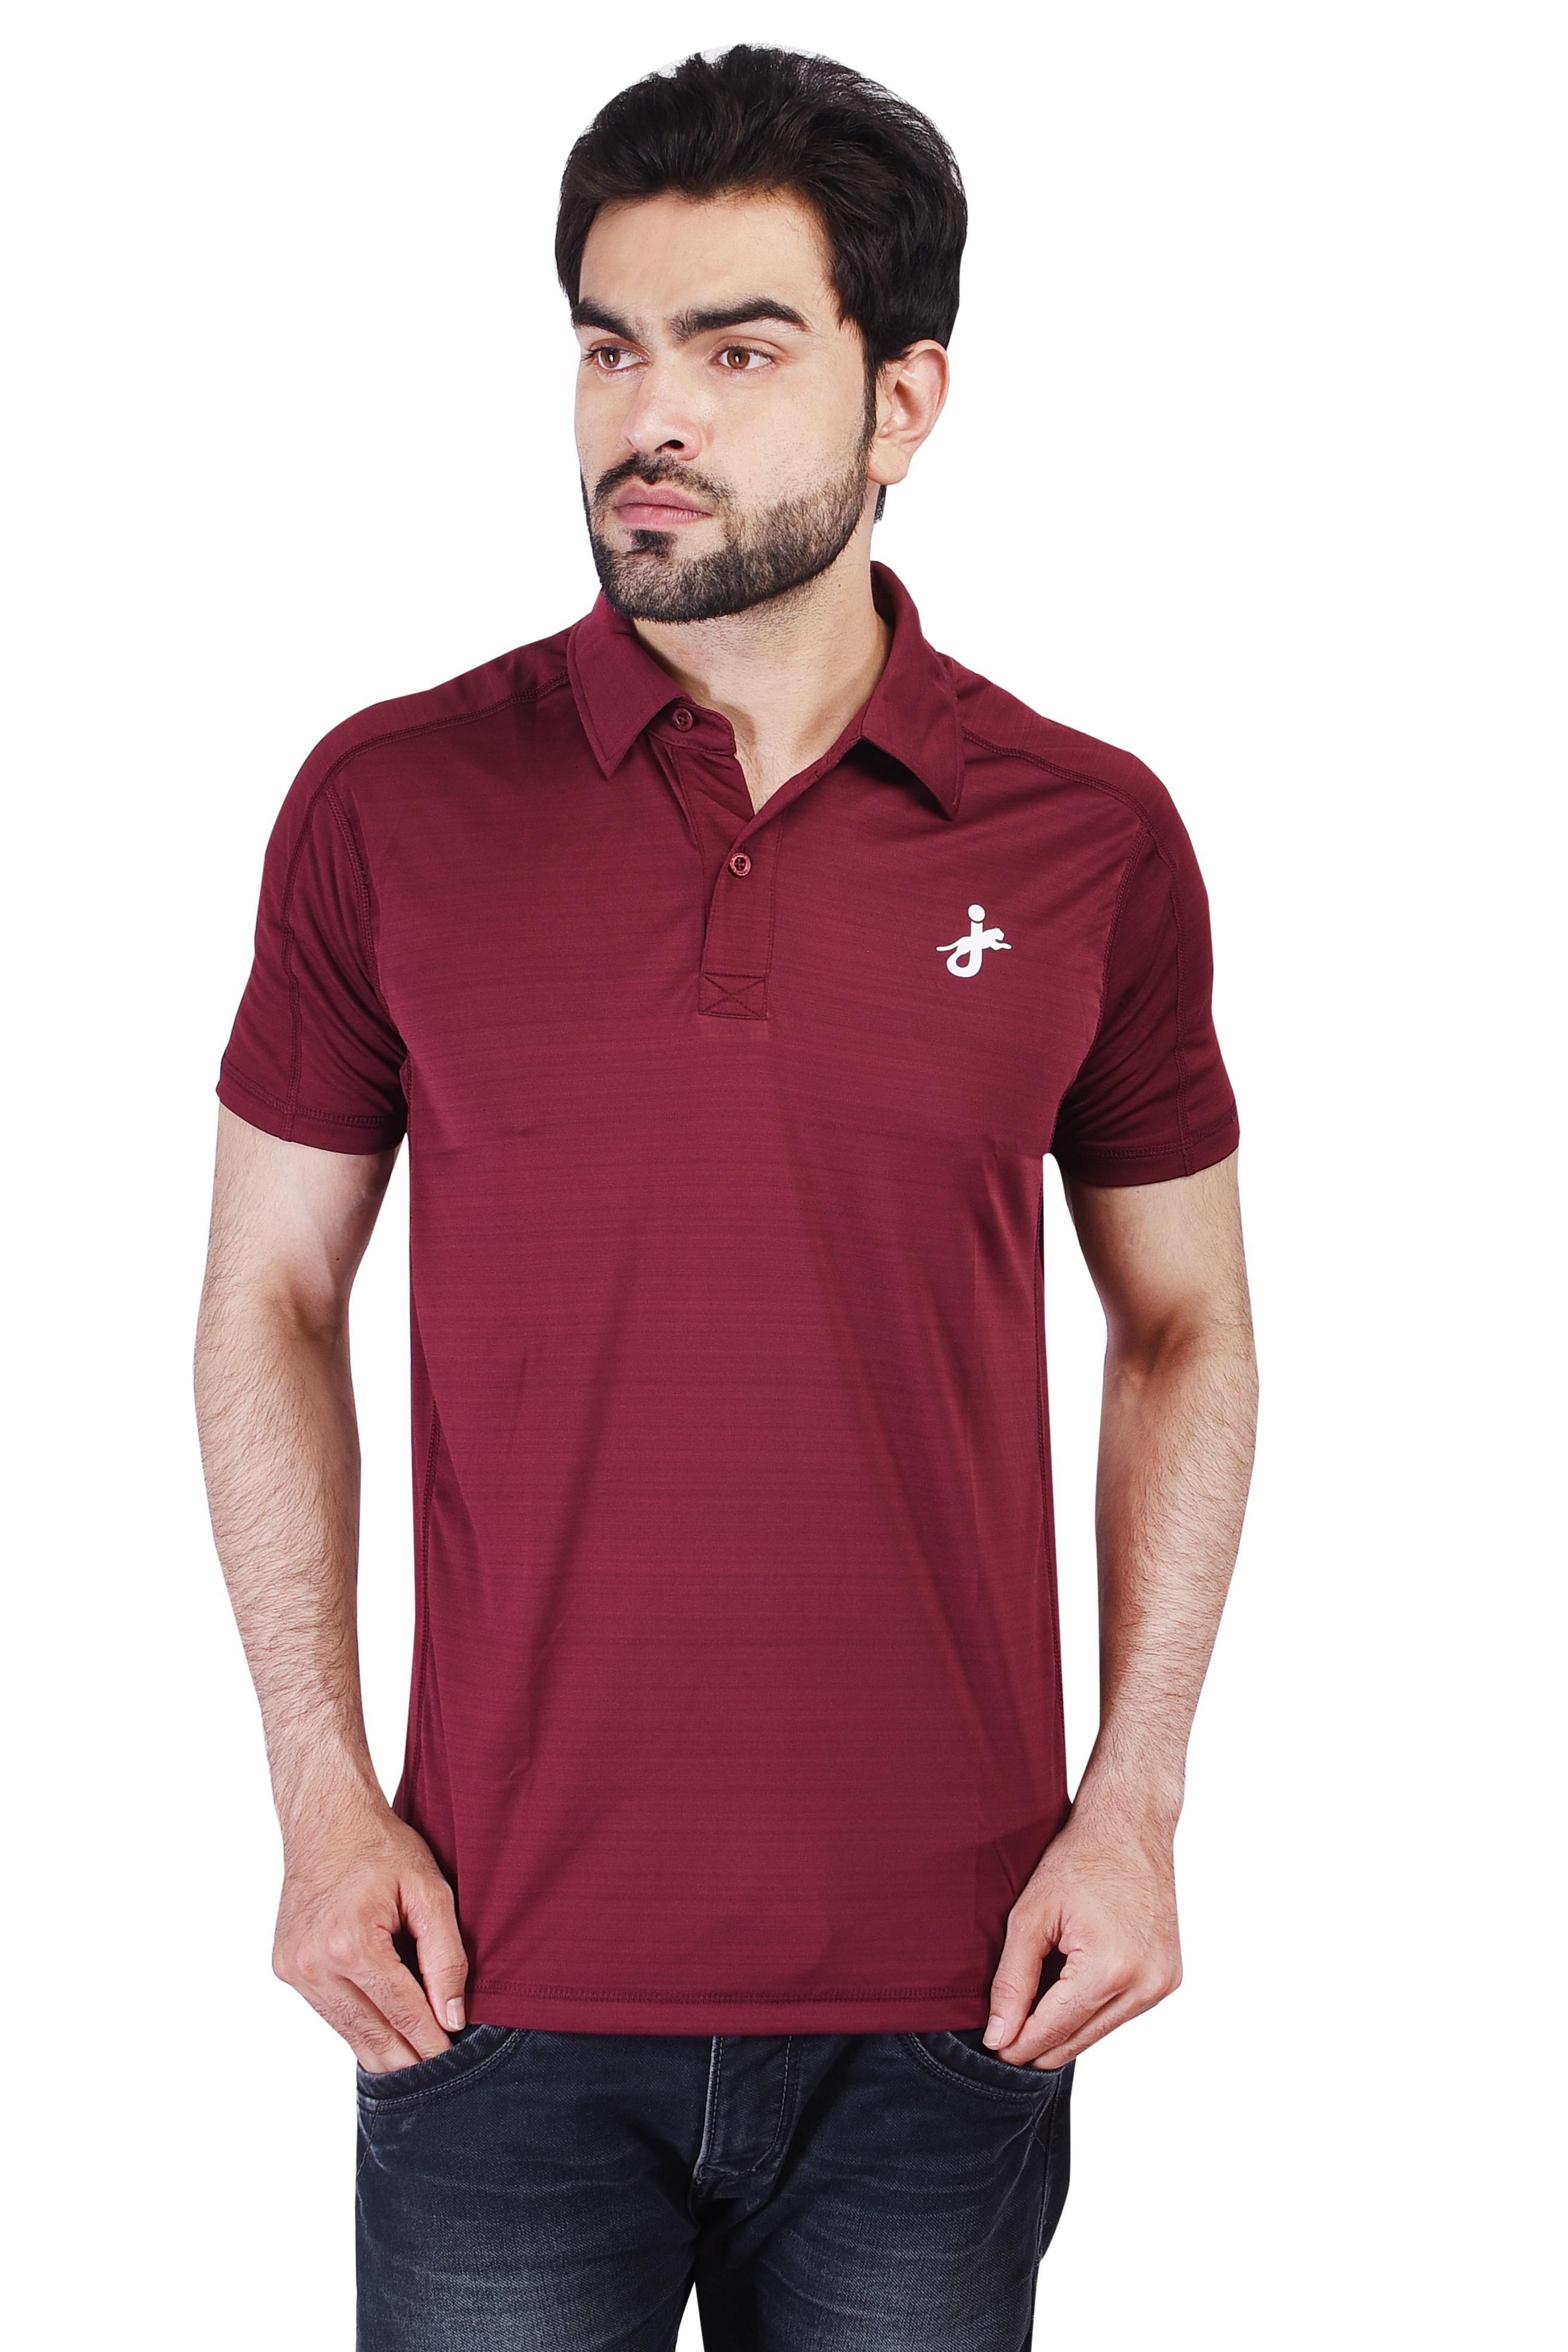 JAGURO   JAGURO Men Casaul Polyester Collar Neck T_Shirt